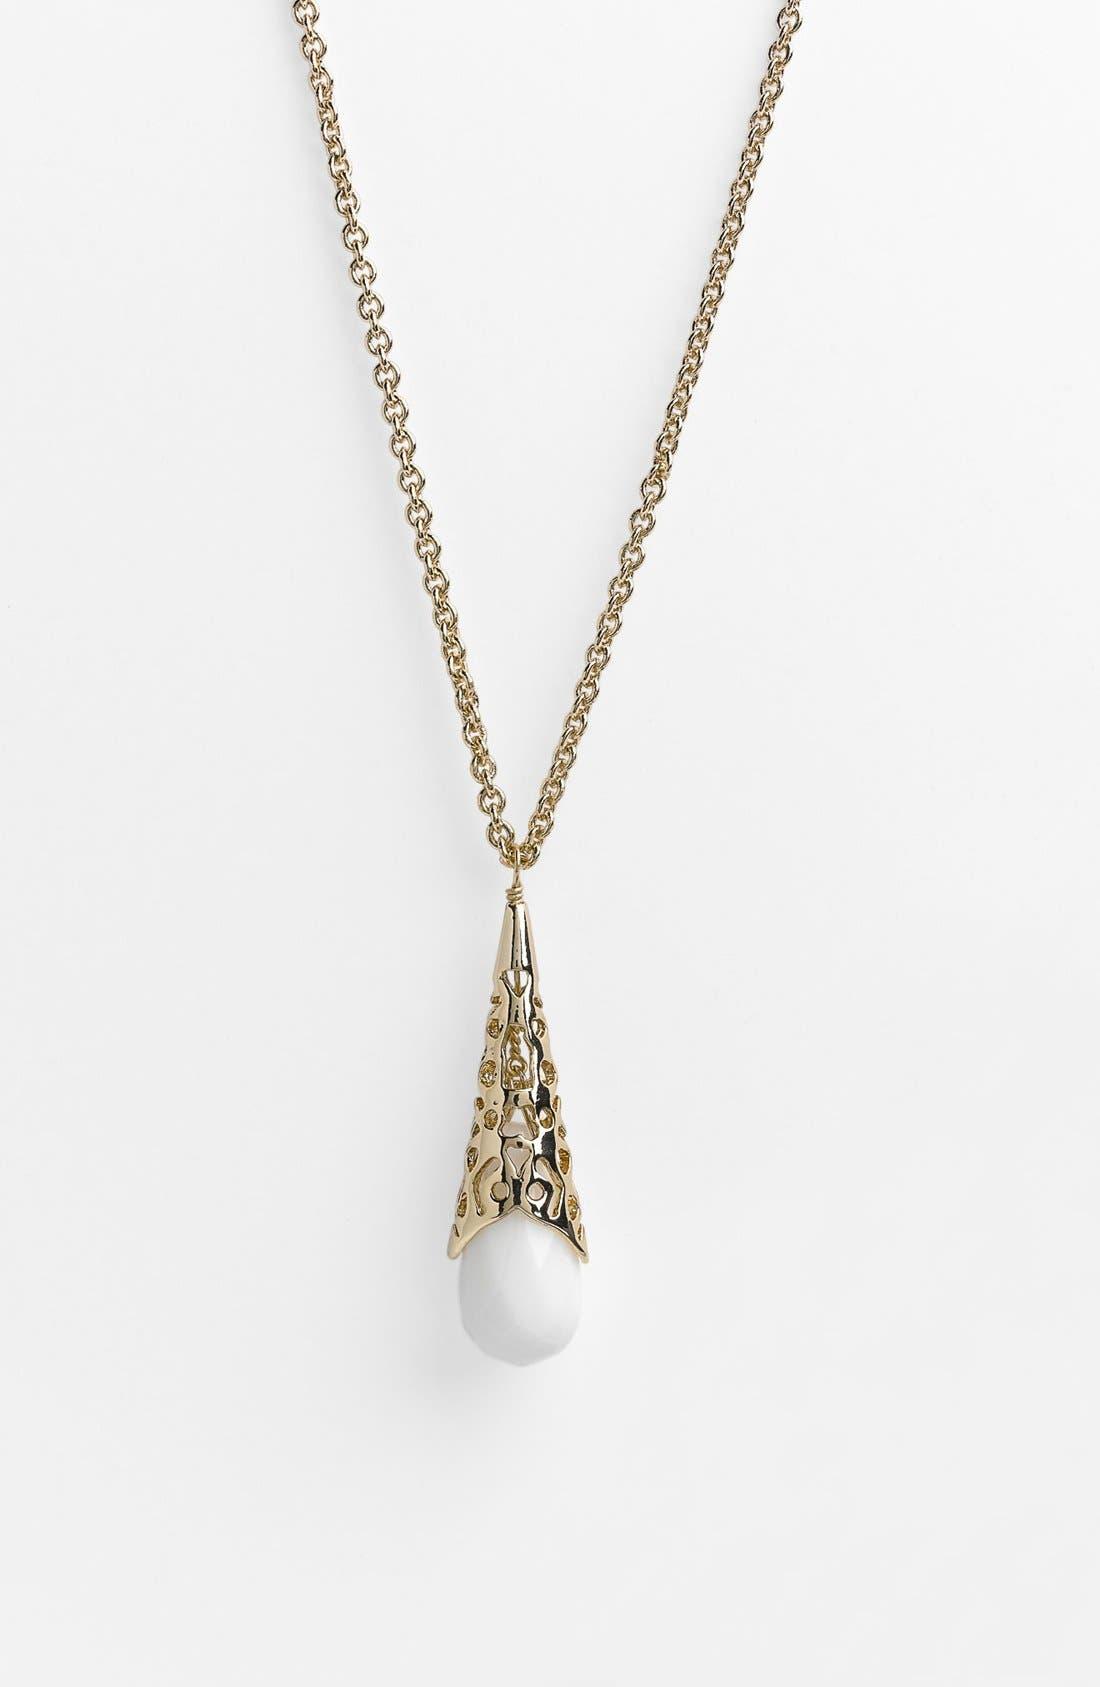 Alternate Image 1 Selected - Kendra Scott 'Priya' Pendant Necklace (Nordstrom Exclusive)